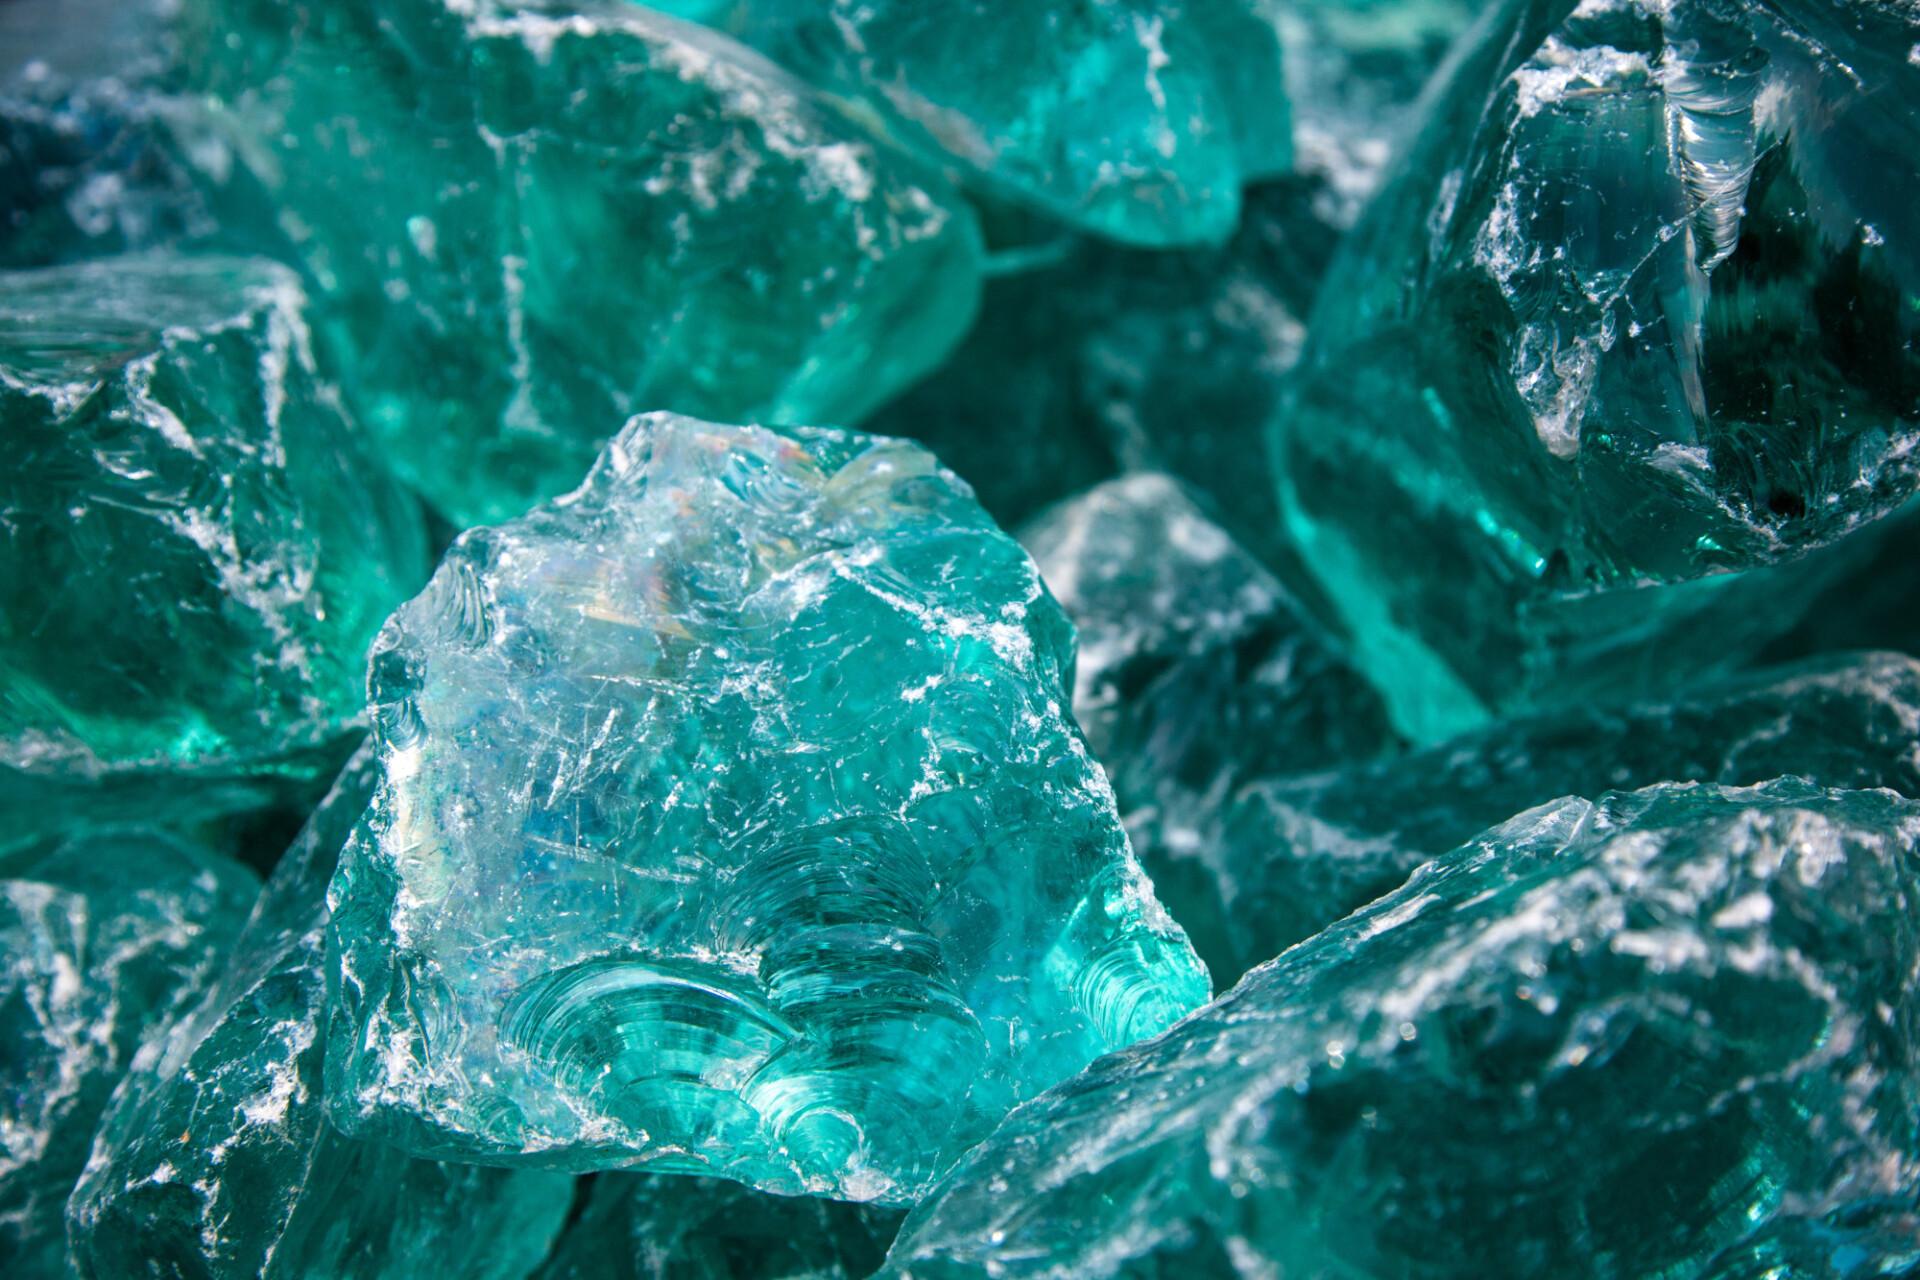 turquoise glass stone